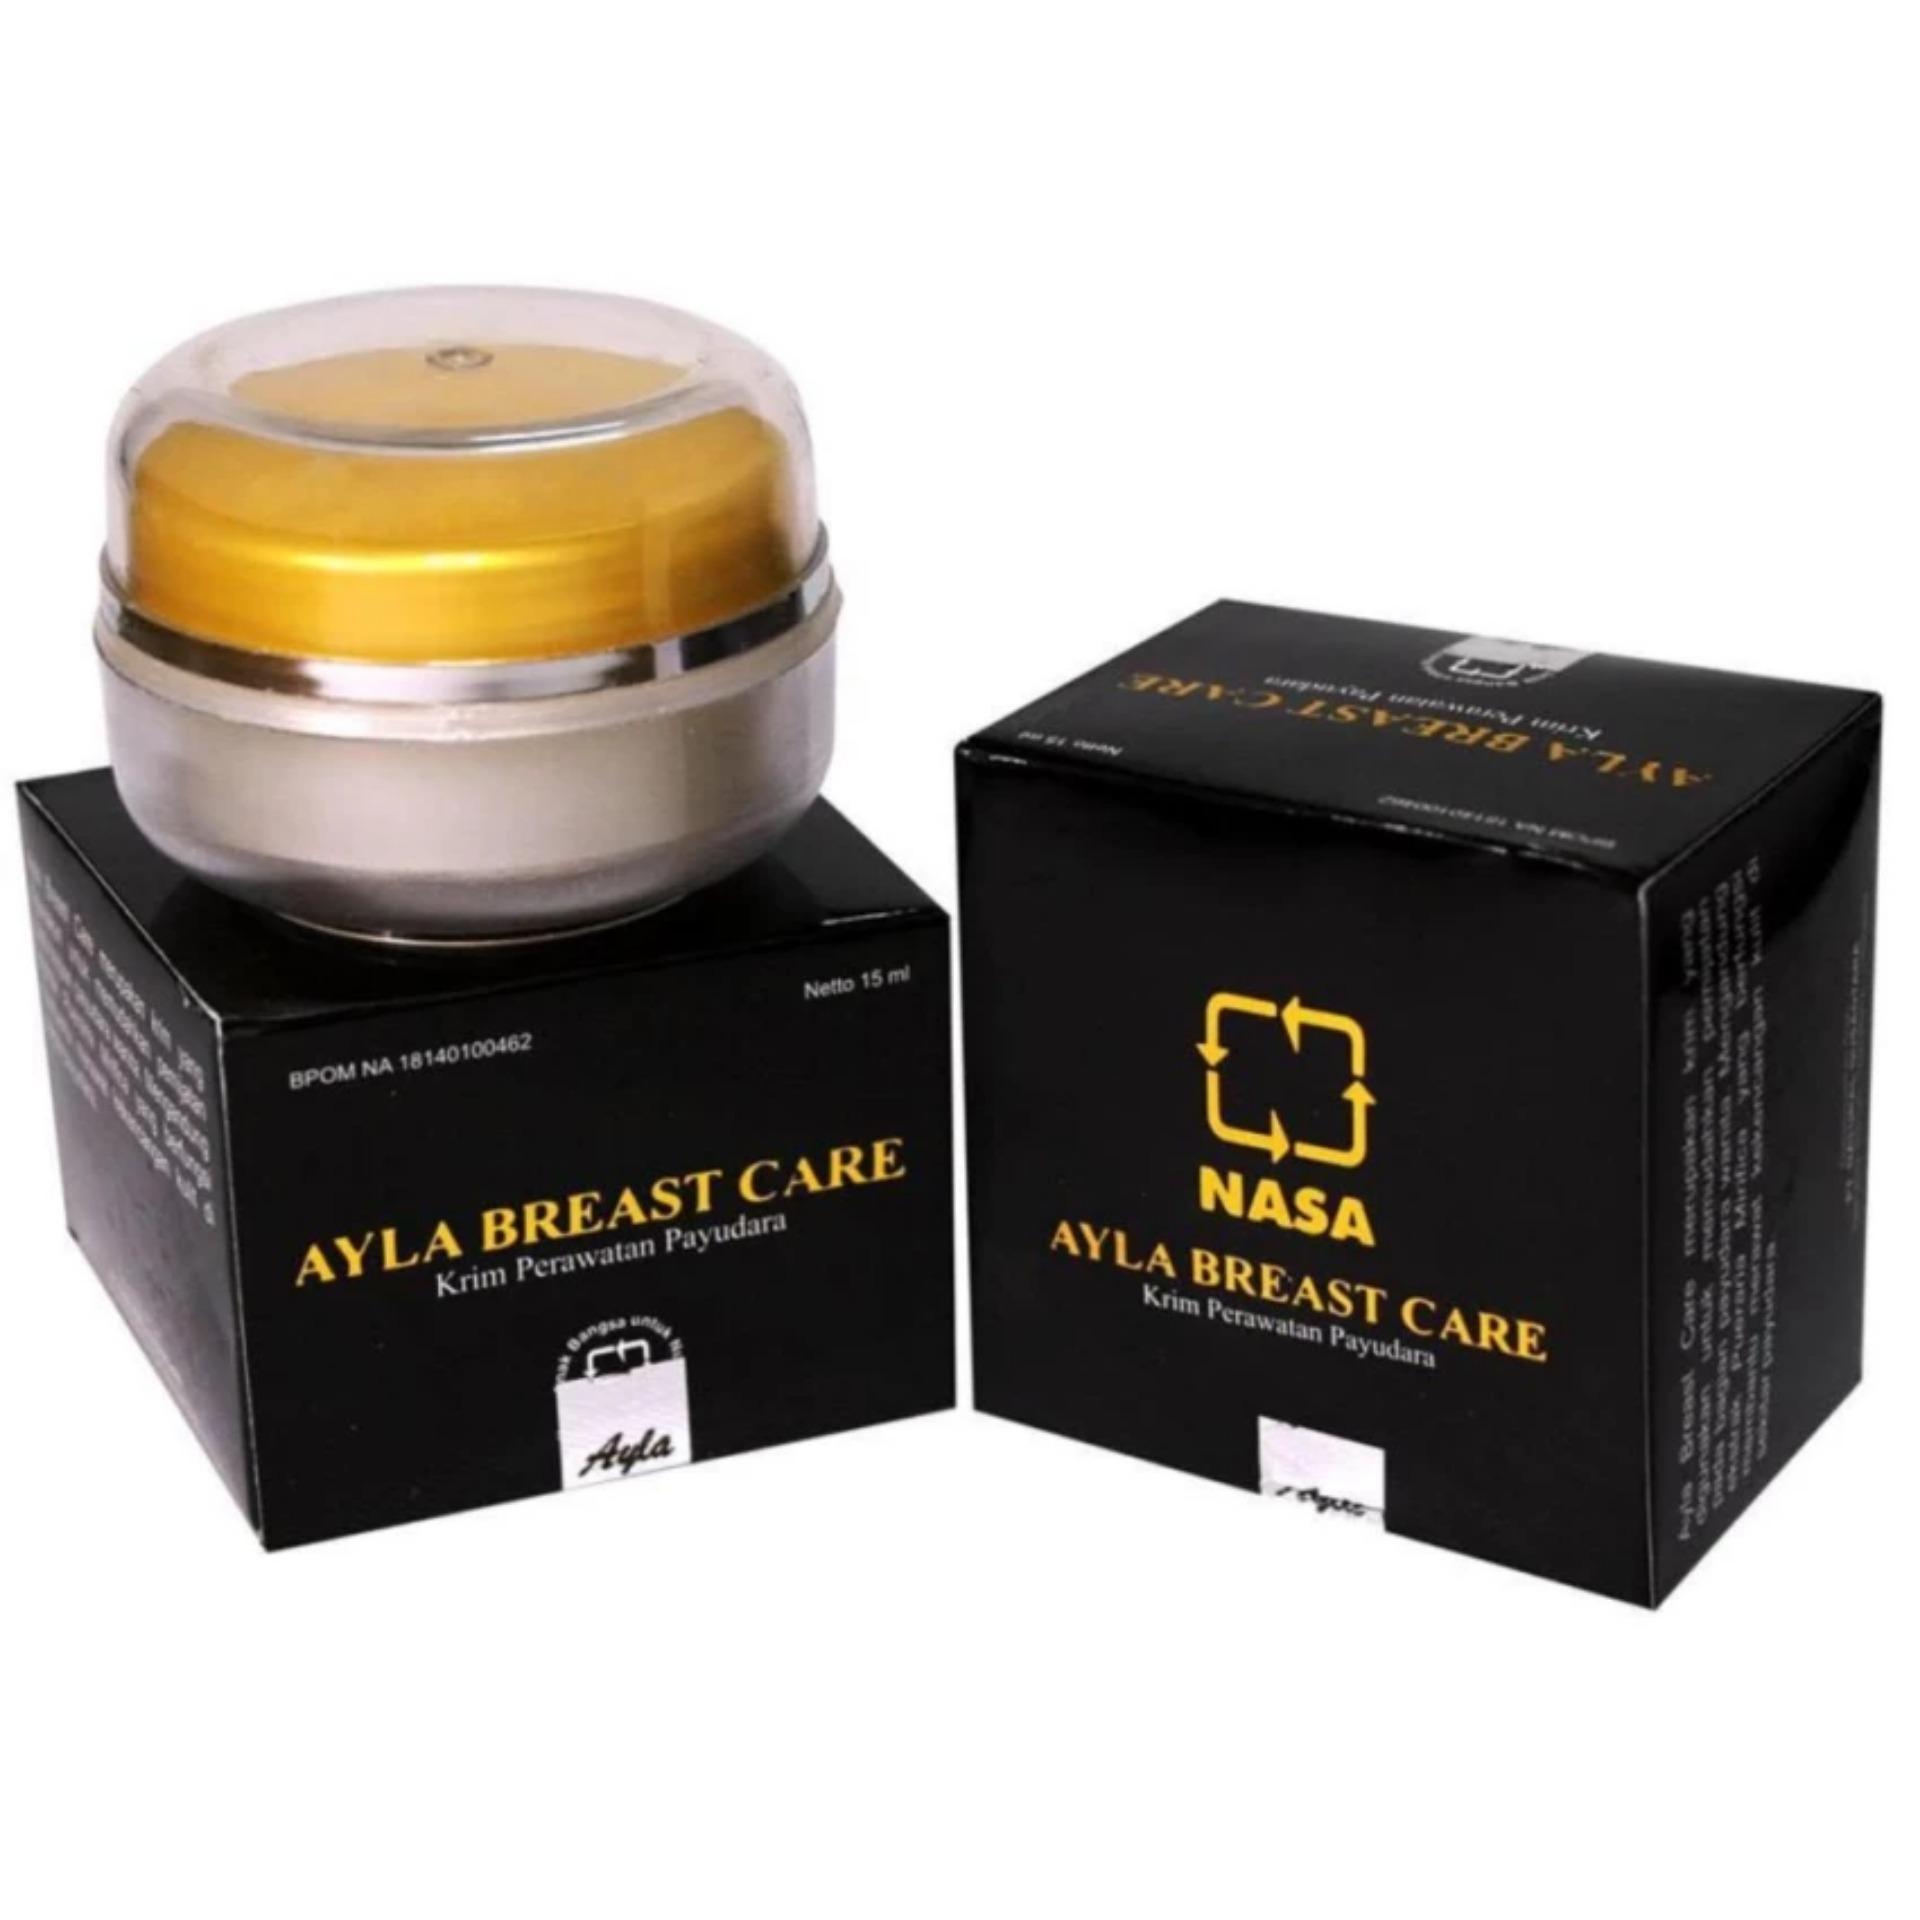 ... CREAM AYLA / AYLA BREAST CARE/ CREAM PAYUDARA AYLA ...